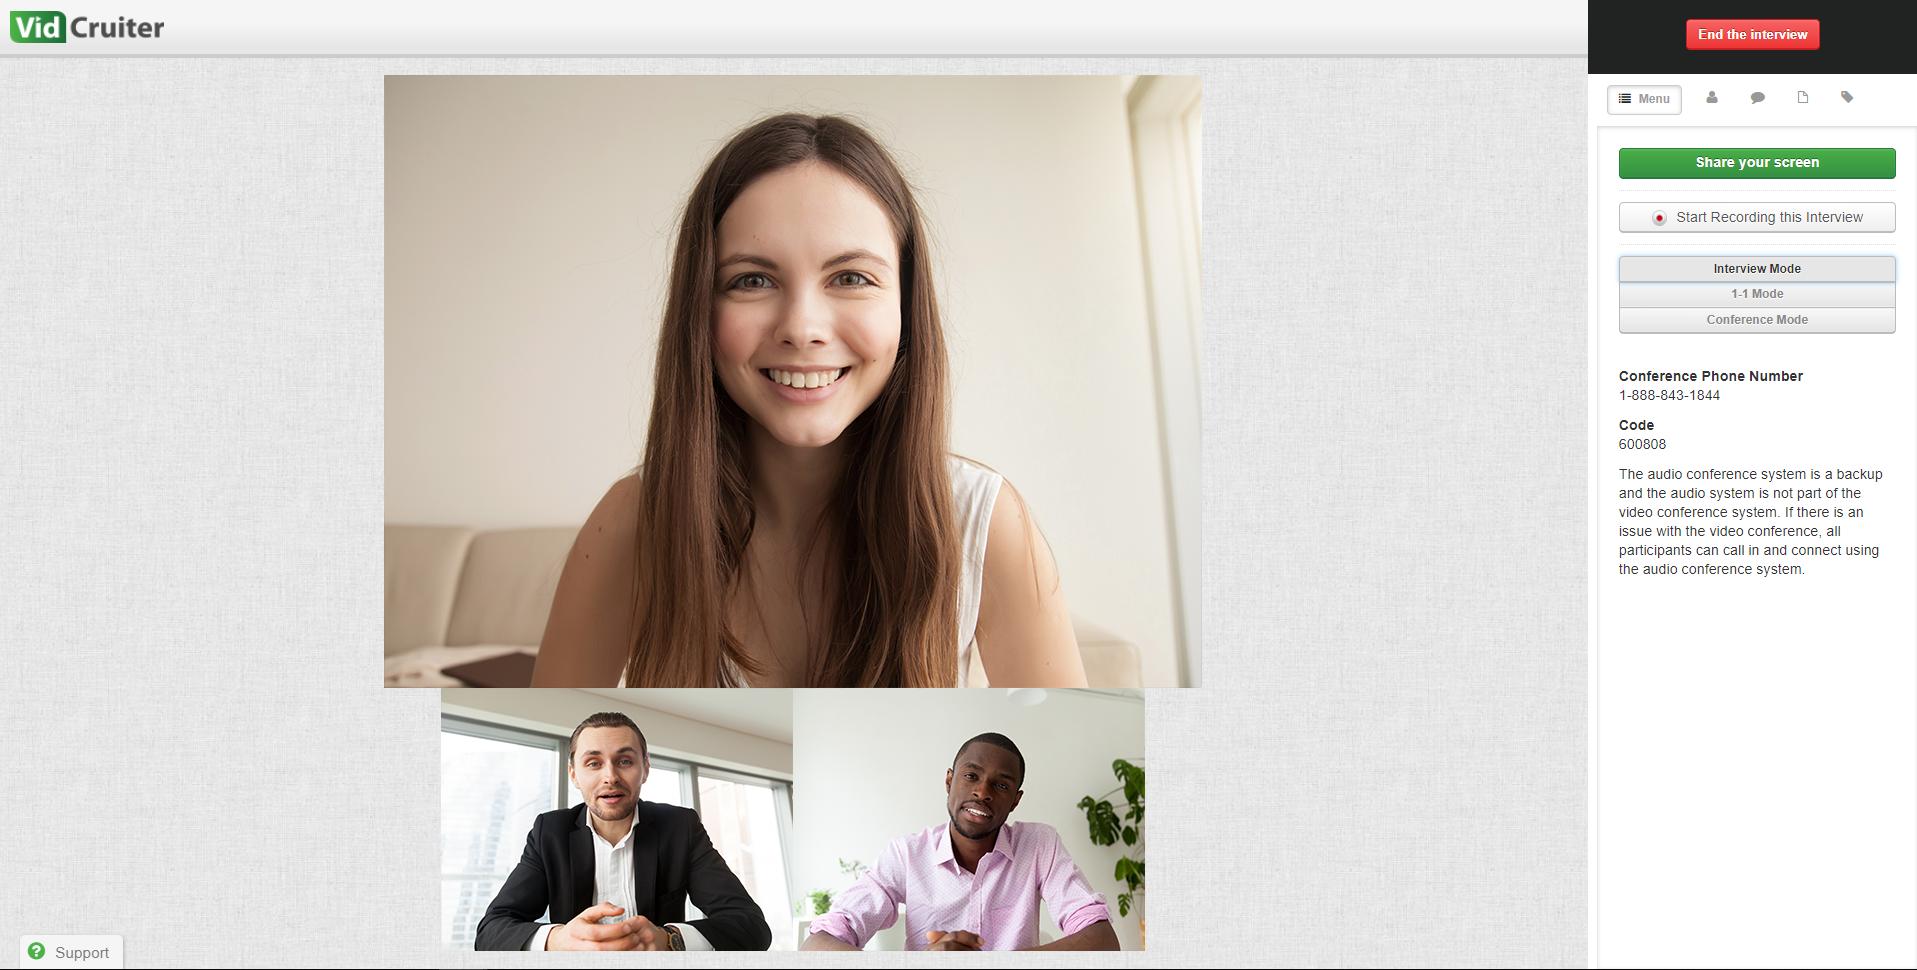 VidCruiter Software - Live video interviewing